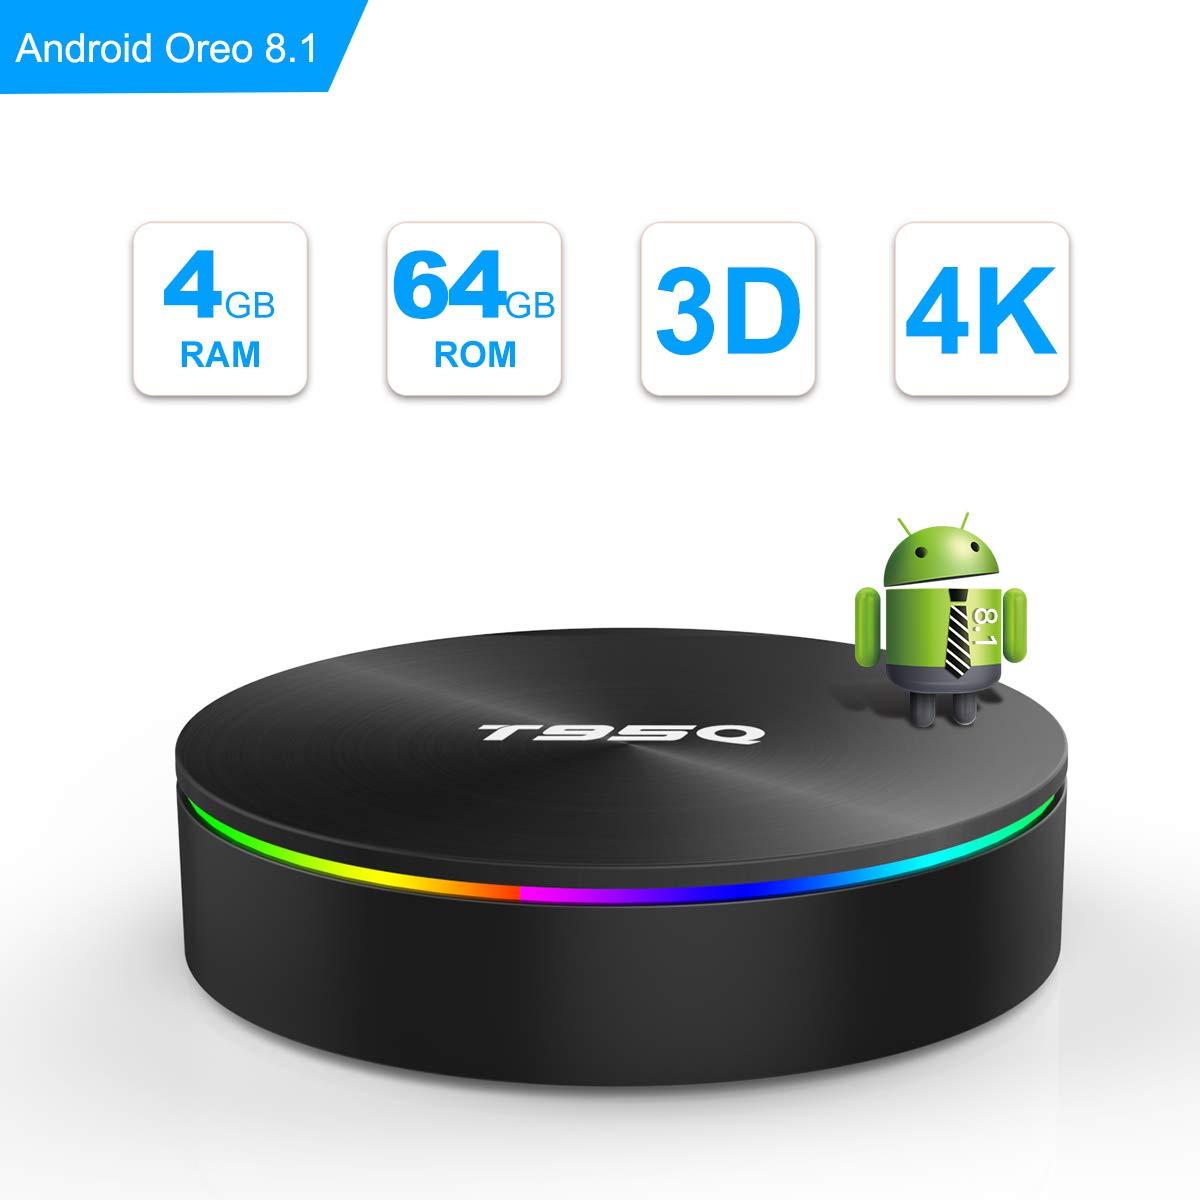 SIDIWEN T95Q Android 8.1 TV Box con 4GB RAM 64GB ROM Amlogic S905X2 Bluetooth4.1 2.4 / 5.0G WiFi Quad Core 64 bits H.265 3D UHD 4K Smart Internet TV Box Junrui